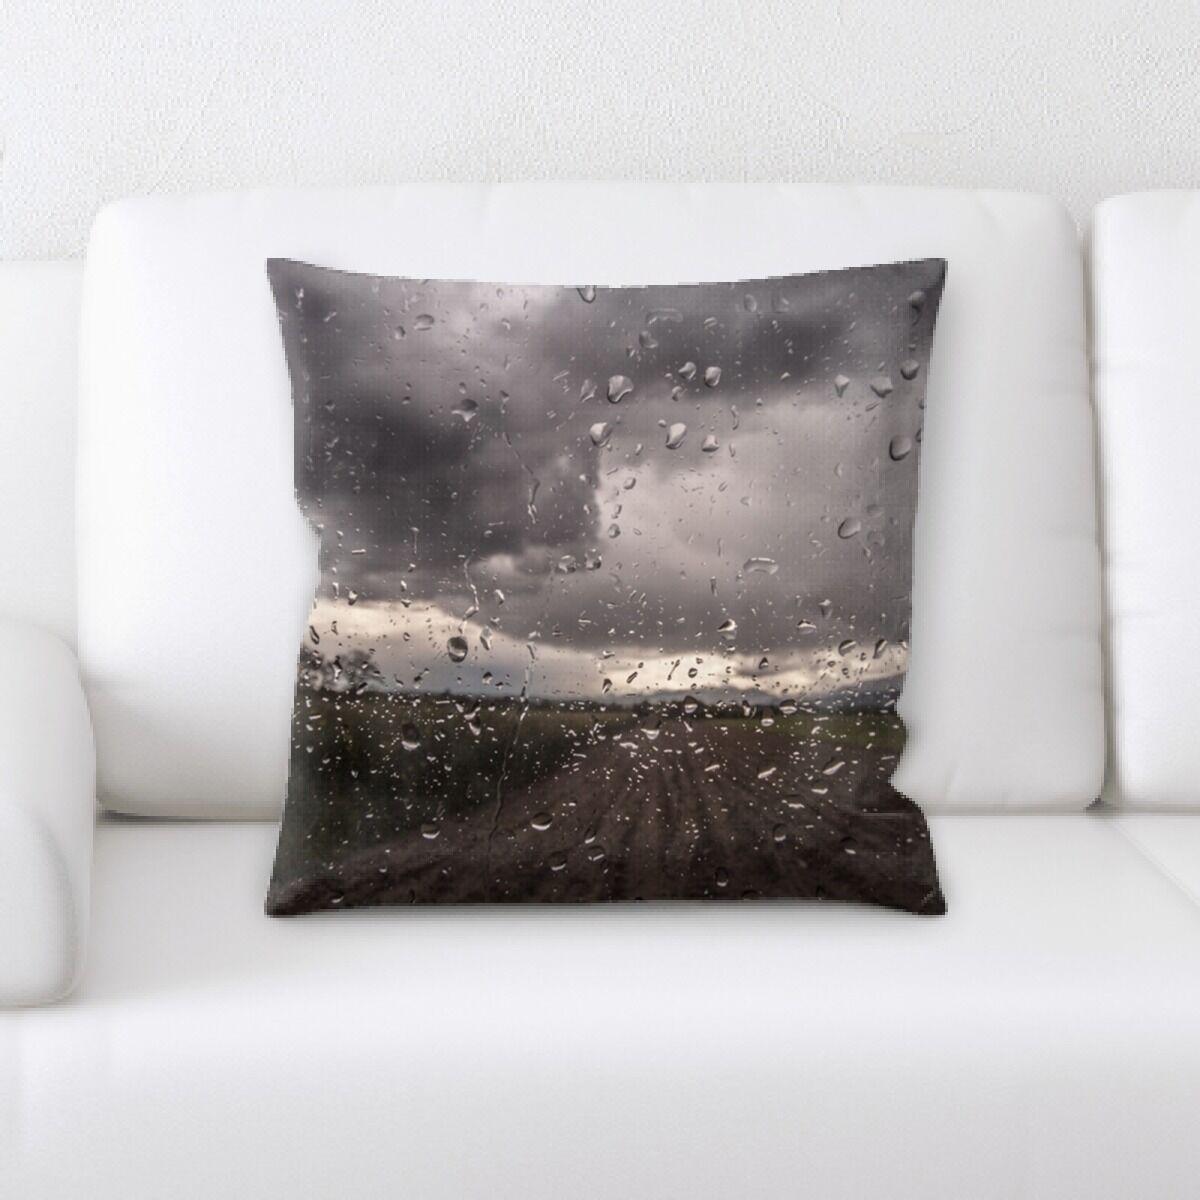 Lawler Rain on a Surface (1) Throw Pillow